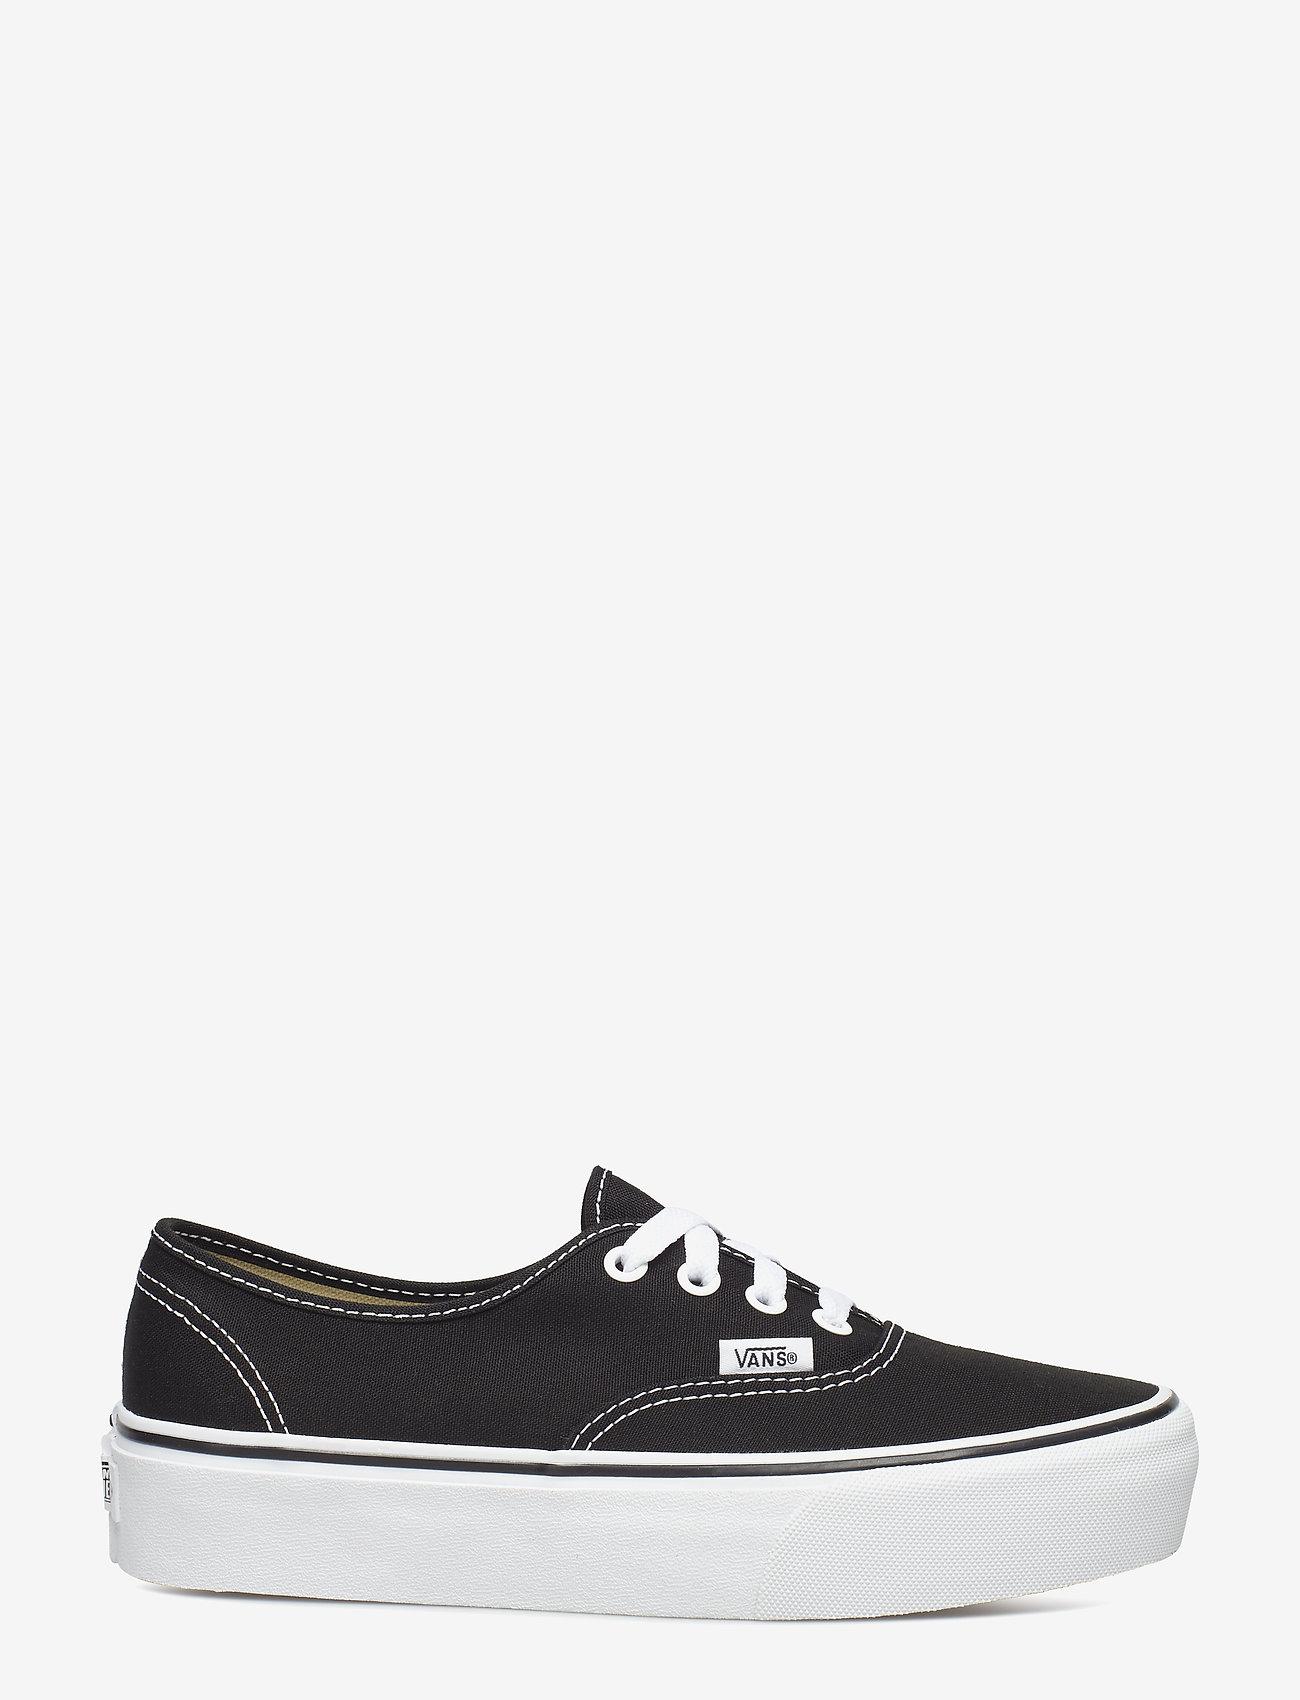 VANS - UA Authentic Platform 2.0 - lage sneakers - black - 1